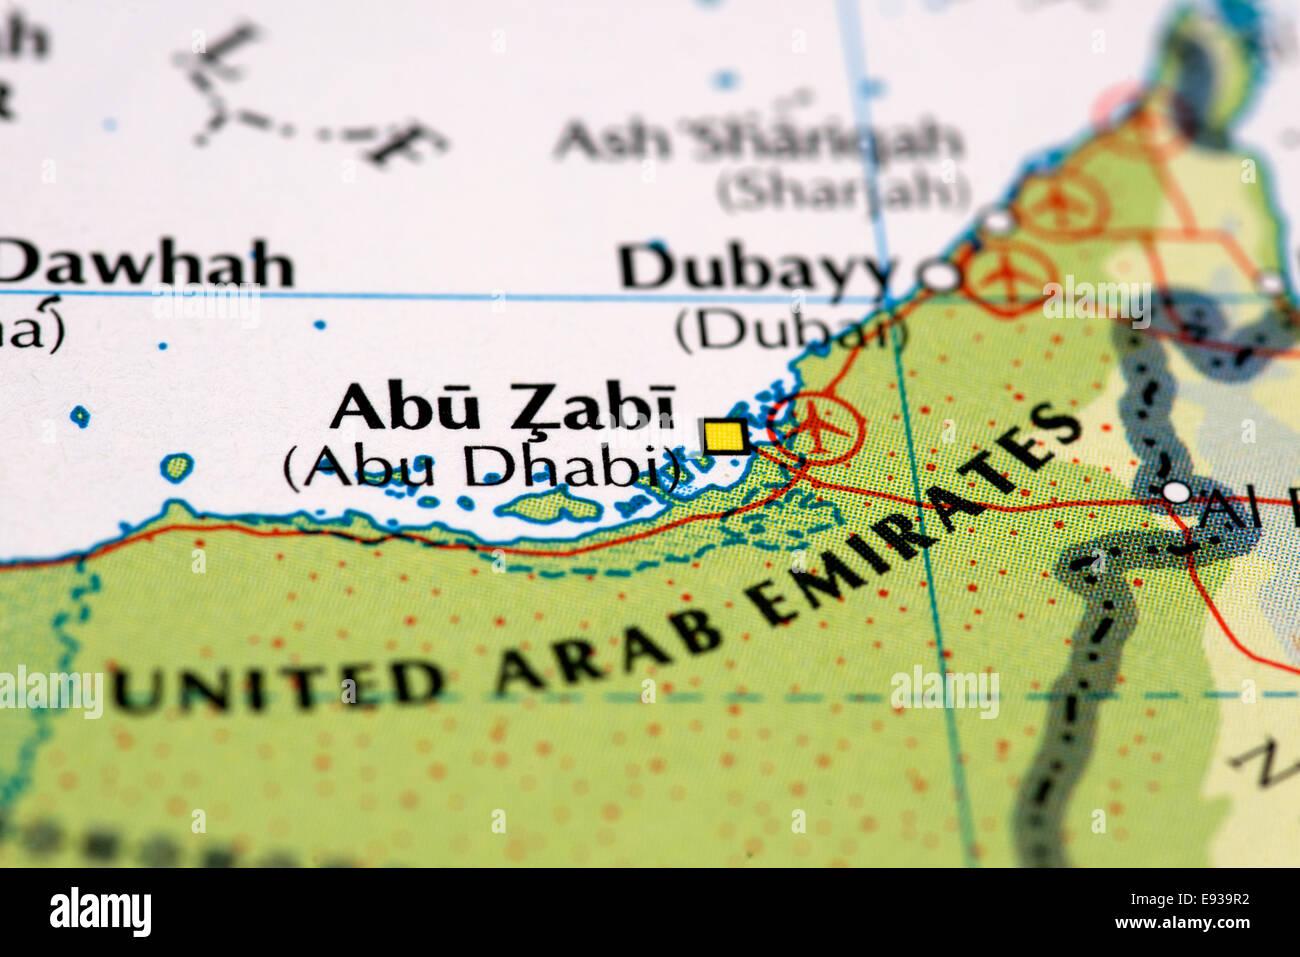 Maps Update 500352 Abu Dhabi and Dubai Map Maps Update 500352 – Abu Dhabi Country Map